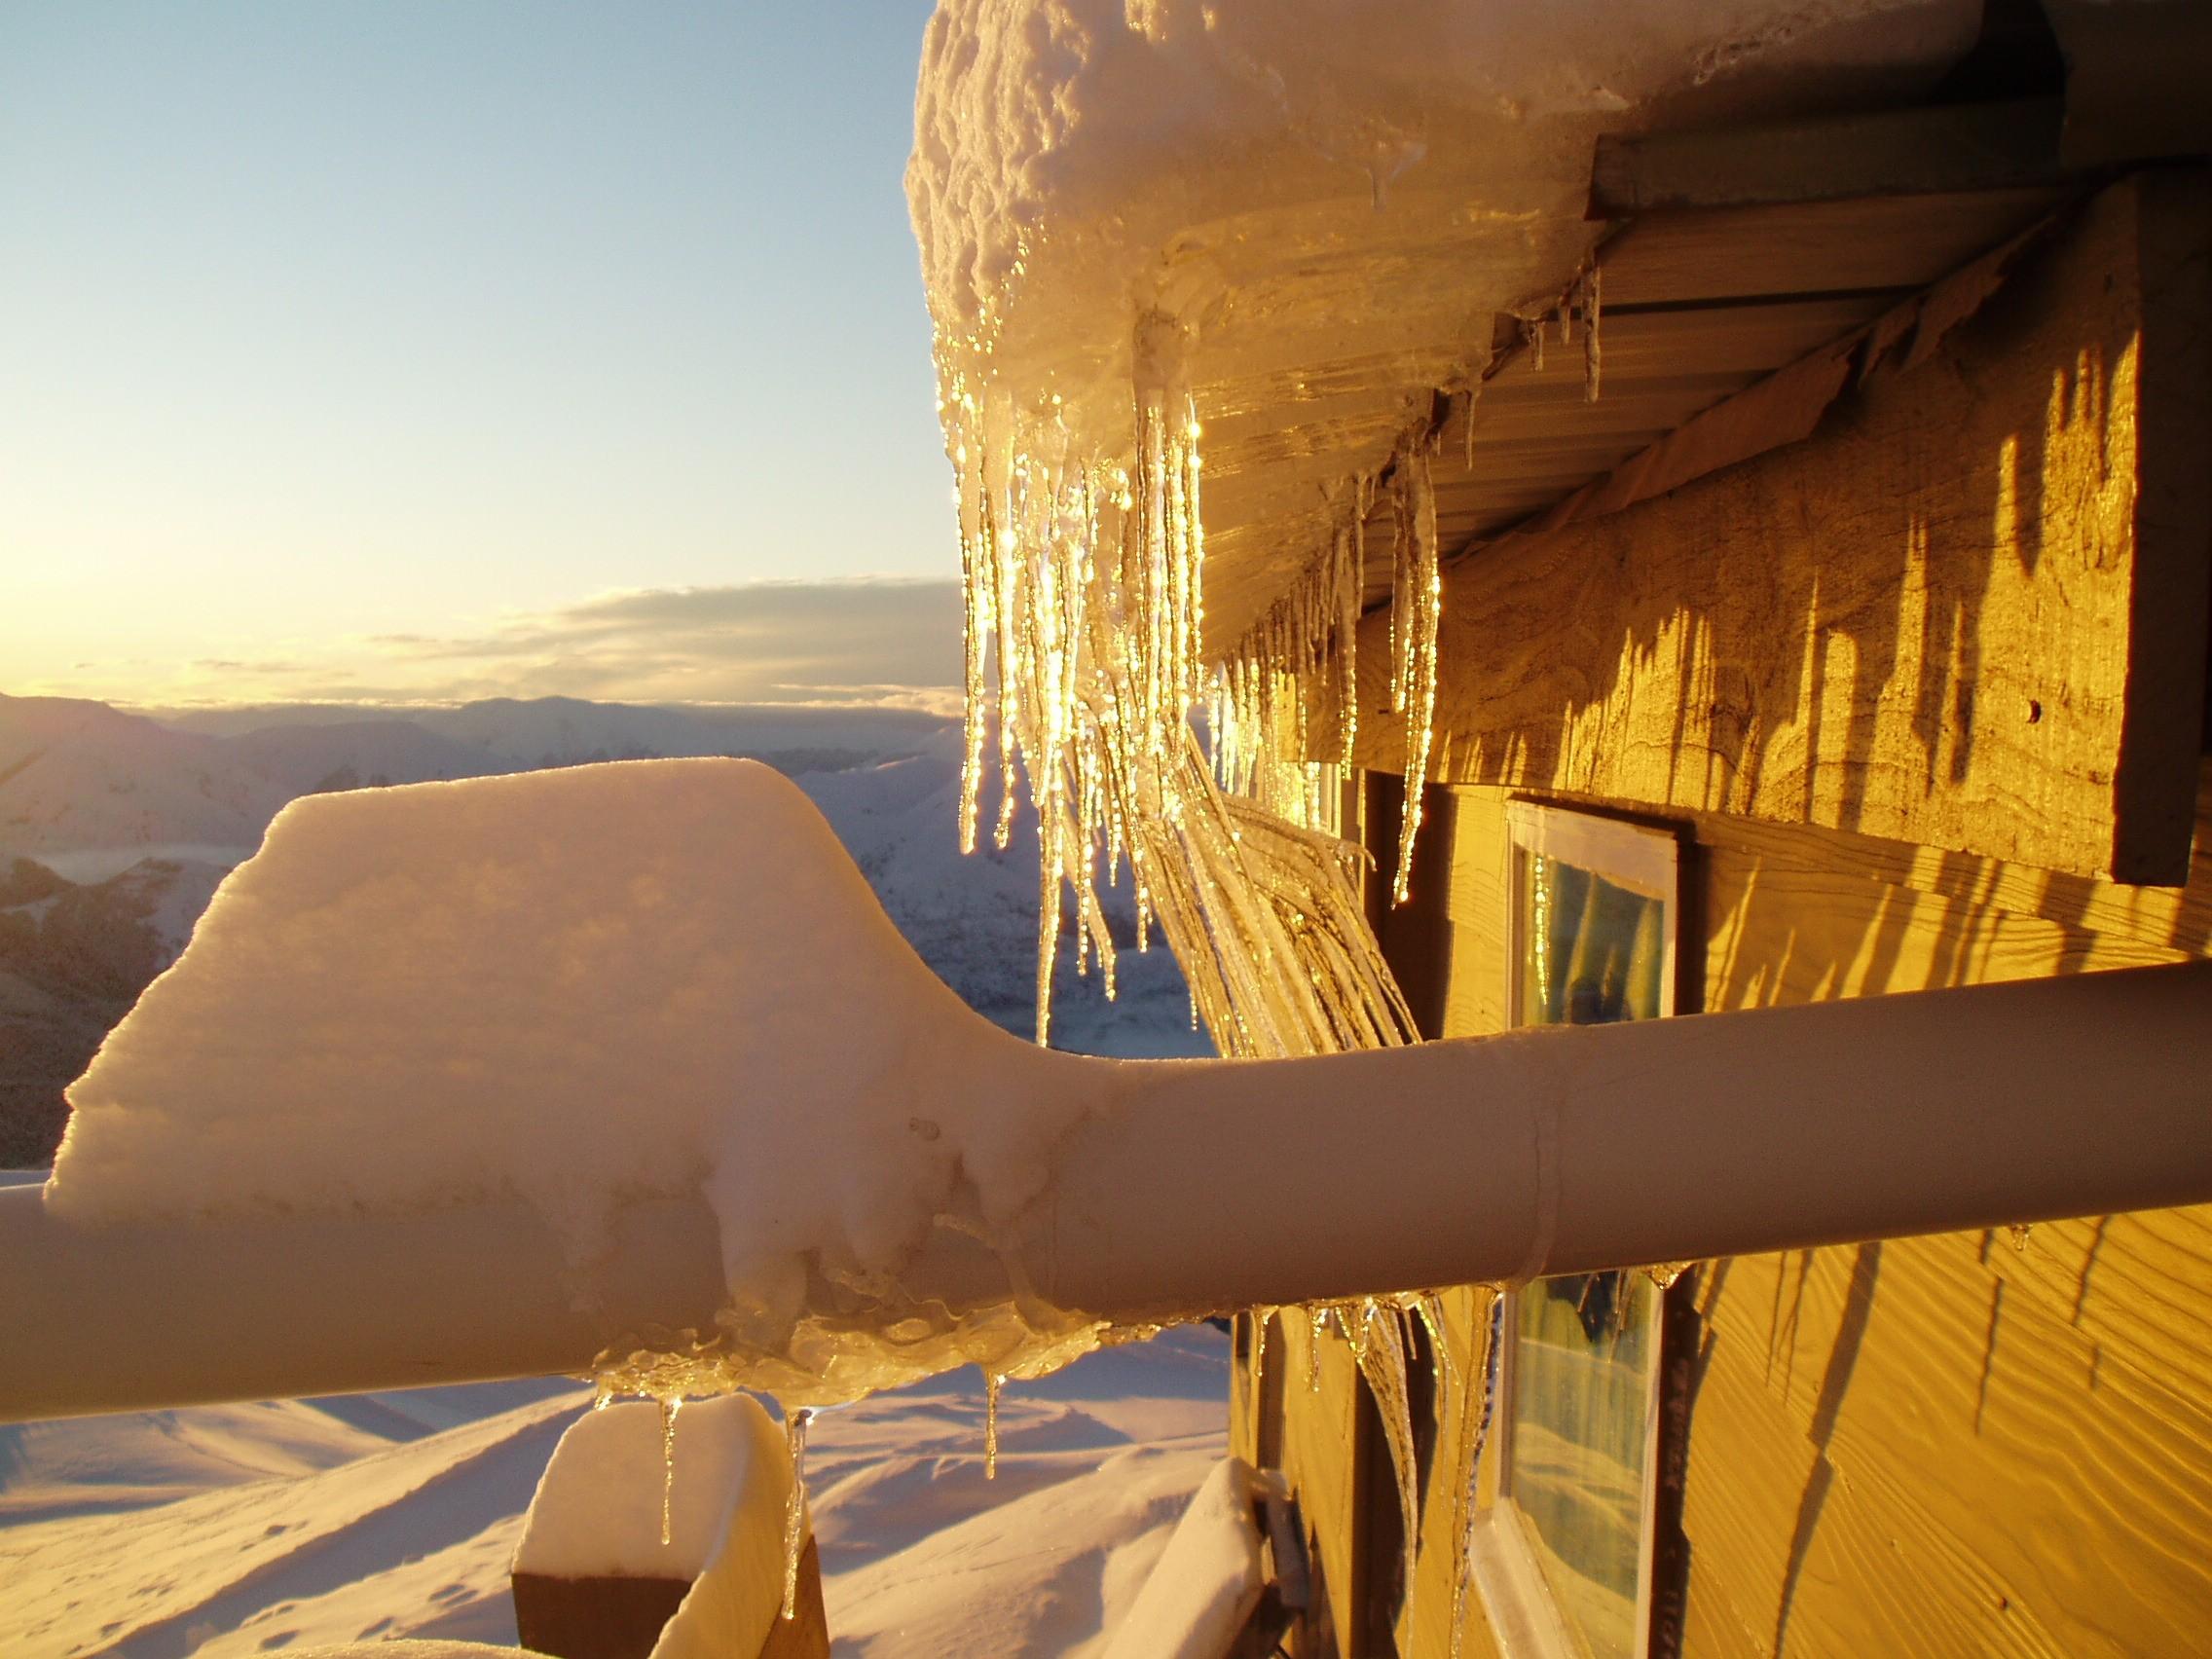 Sunrise at Snowline Lodge, Mount Cheeseman